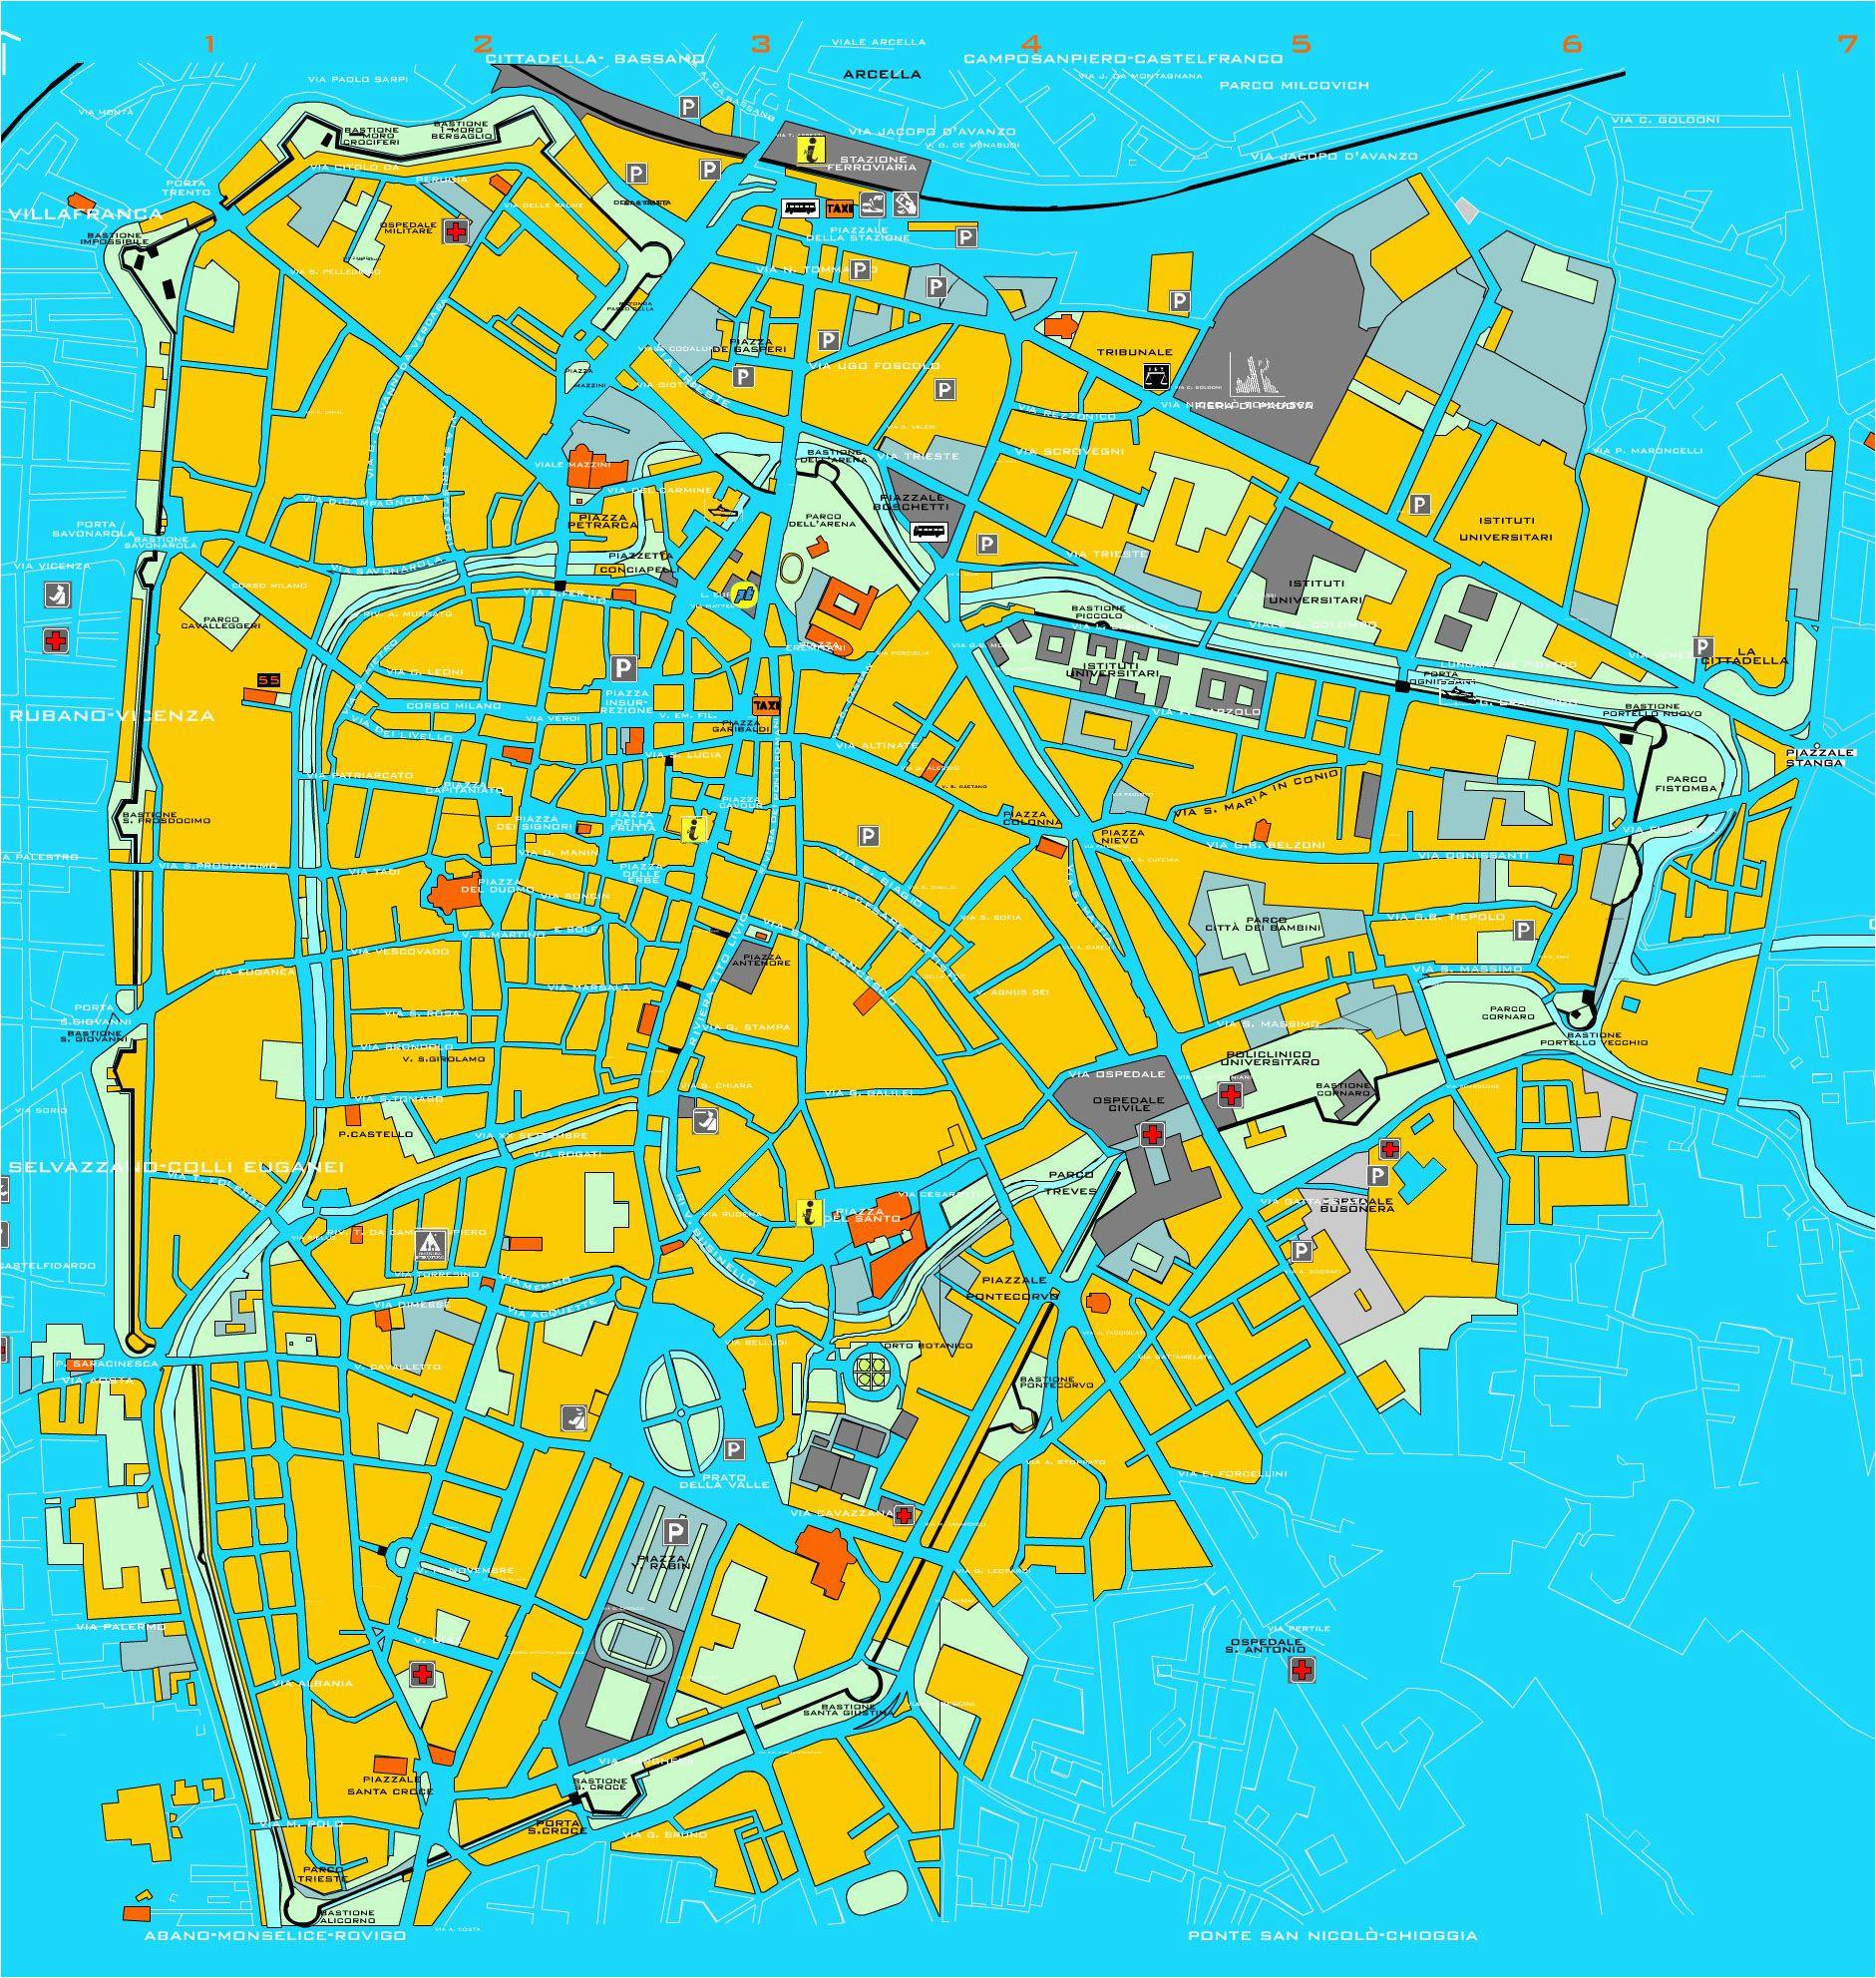 padova tourist map padova italy mappery venice padova